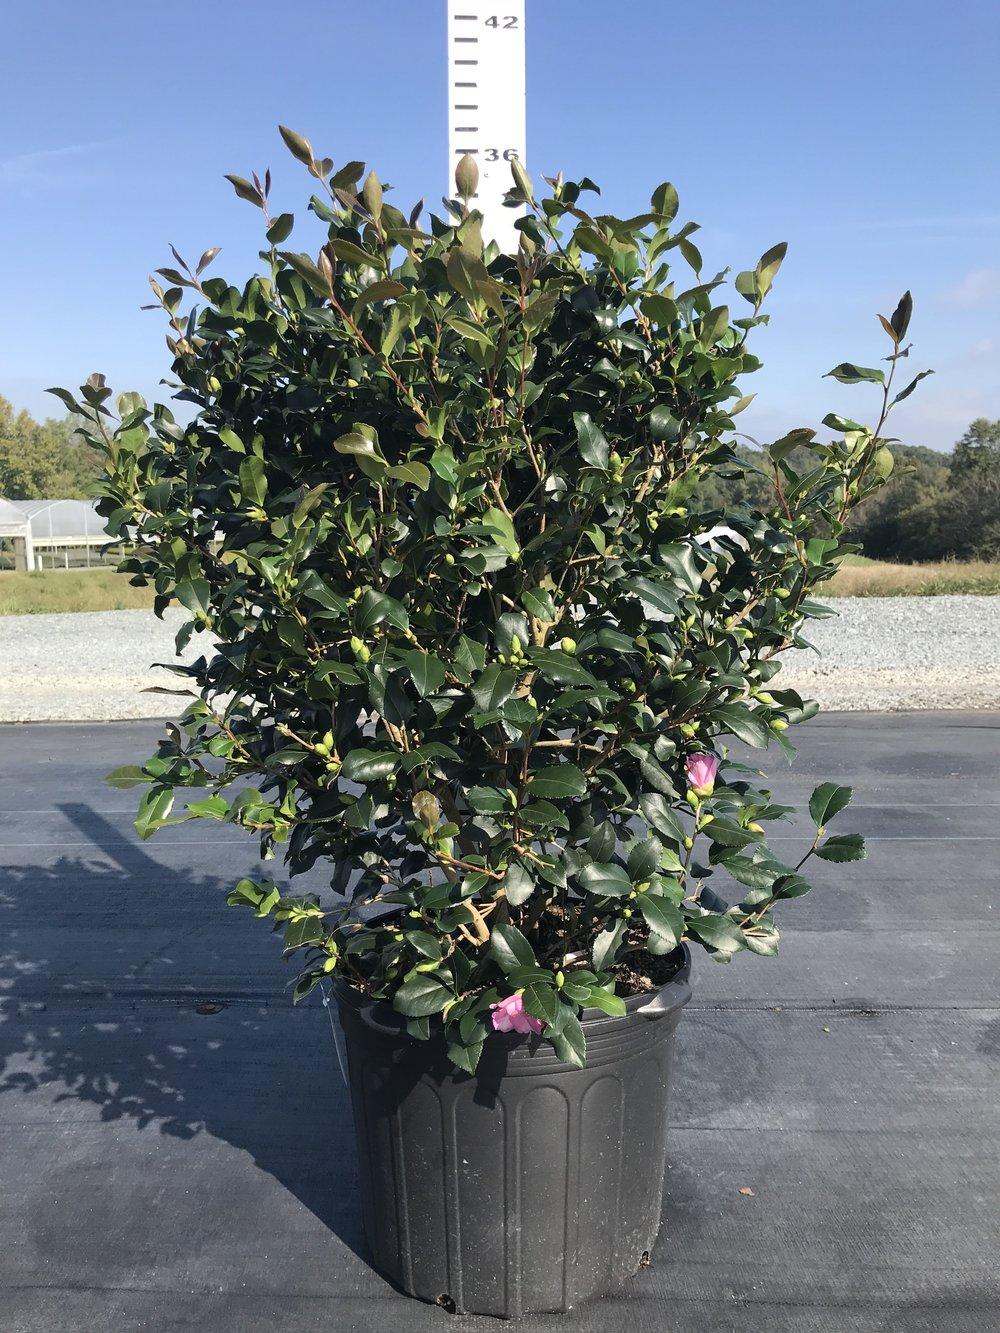 Camellia sasanqua 'Cleopatra' 7g